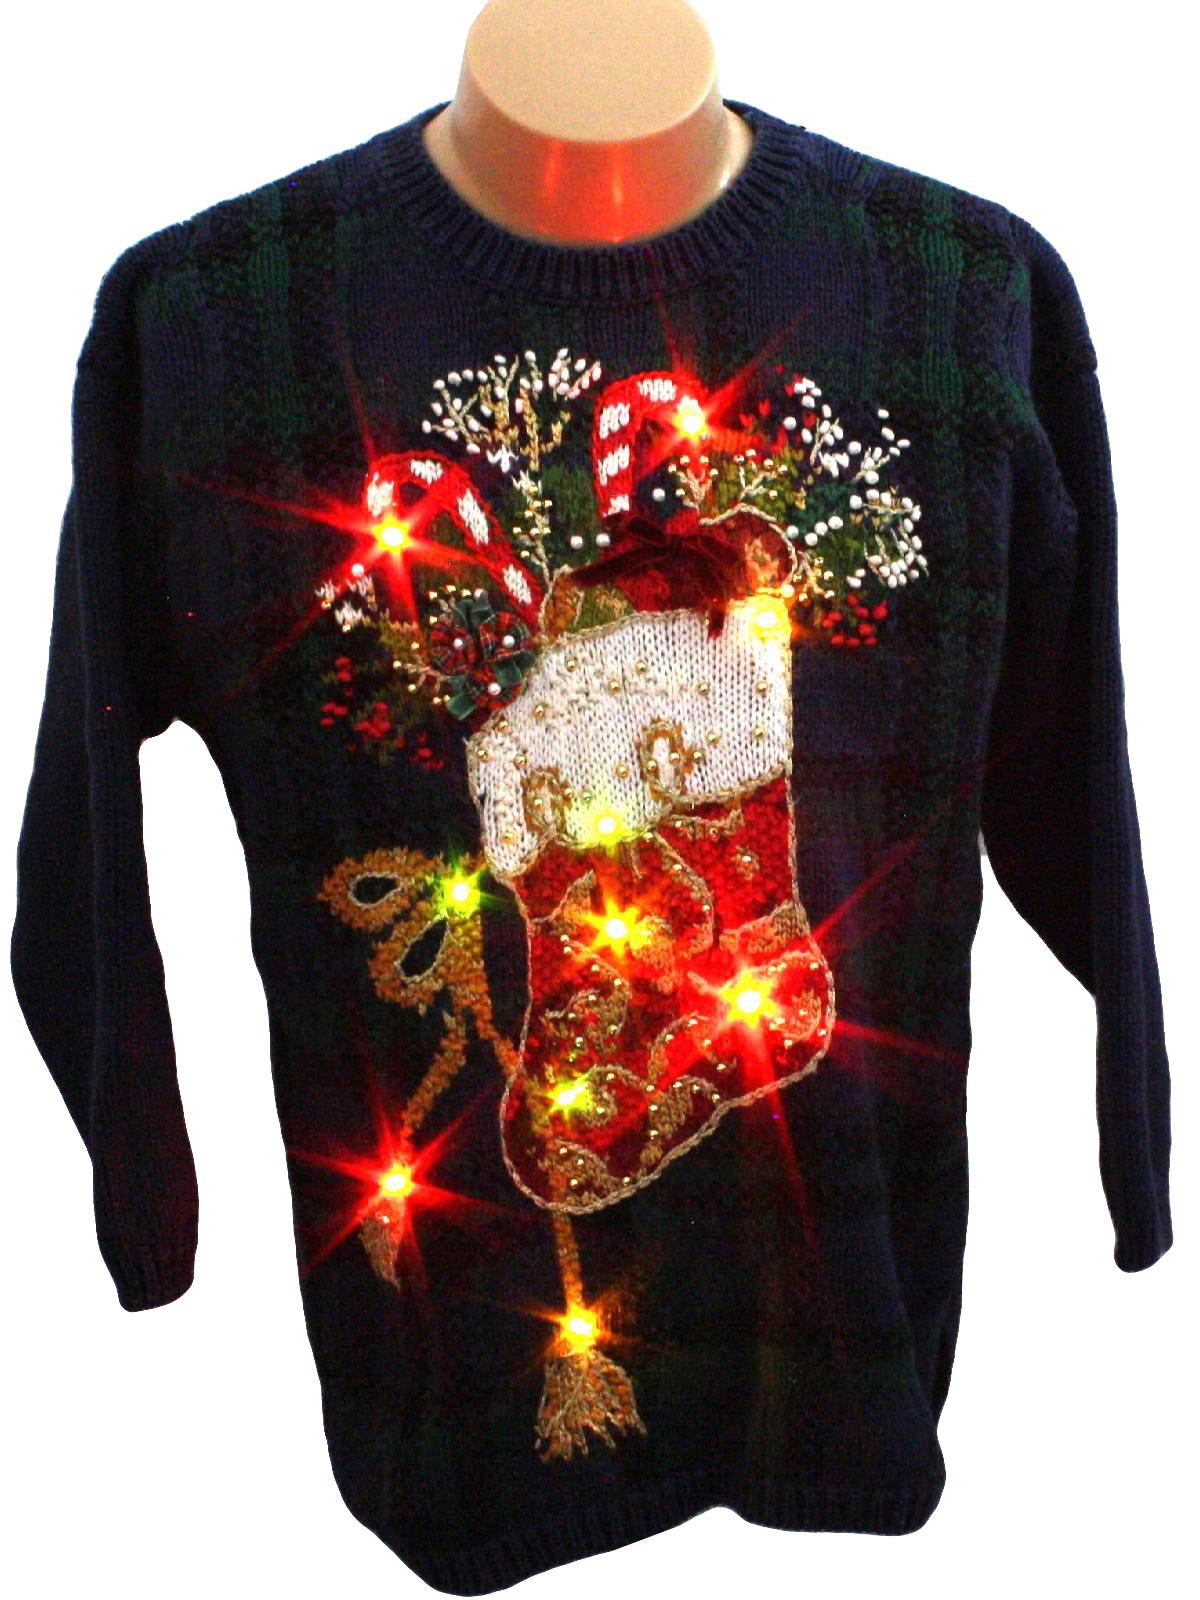 Pilling Sweater